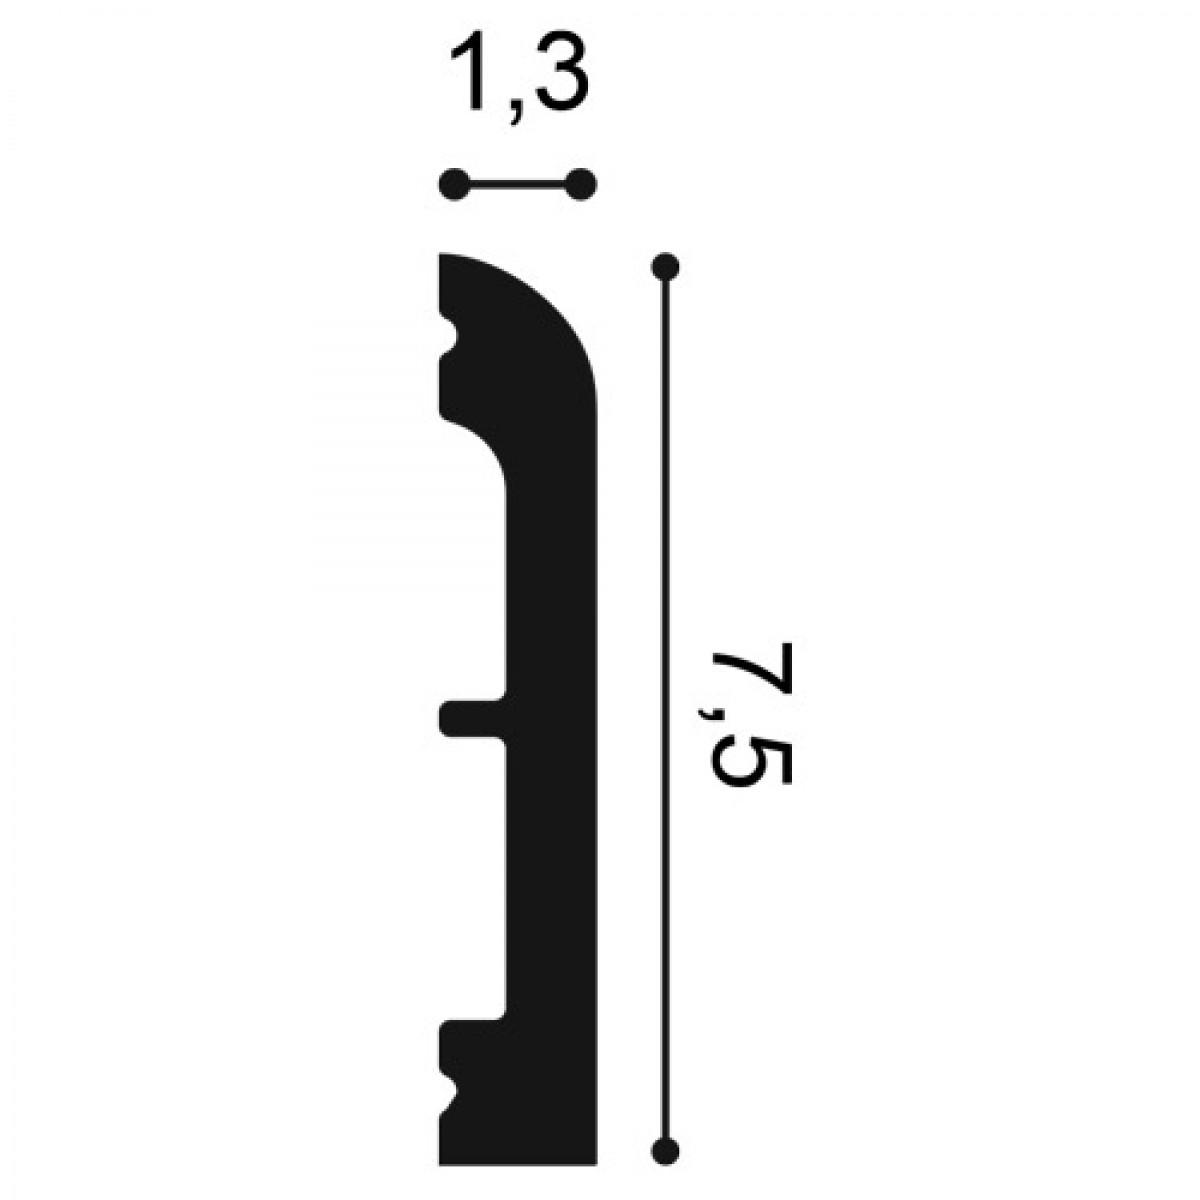 Plinta Flex Axxent SX184, Dimensiuni: 200 X 11 X 1.3 cm, Orac Decor